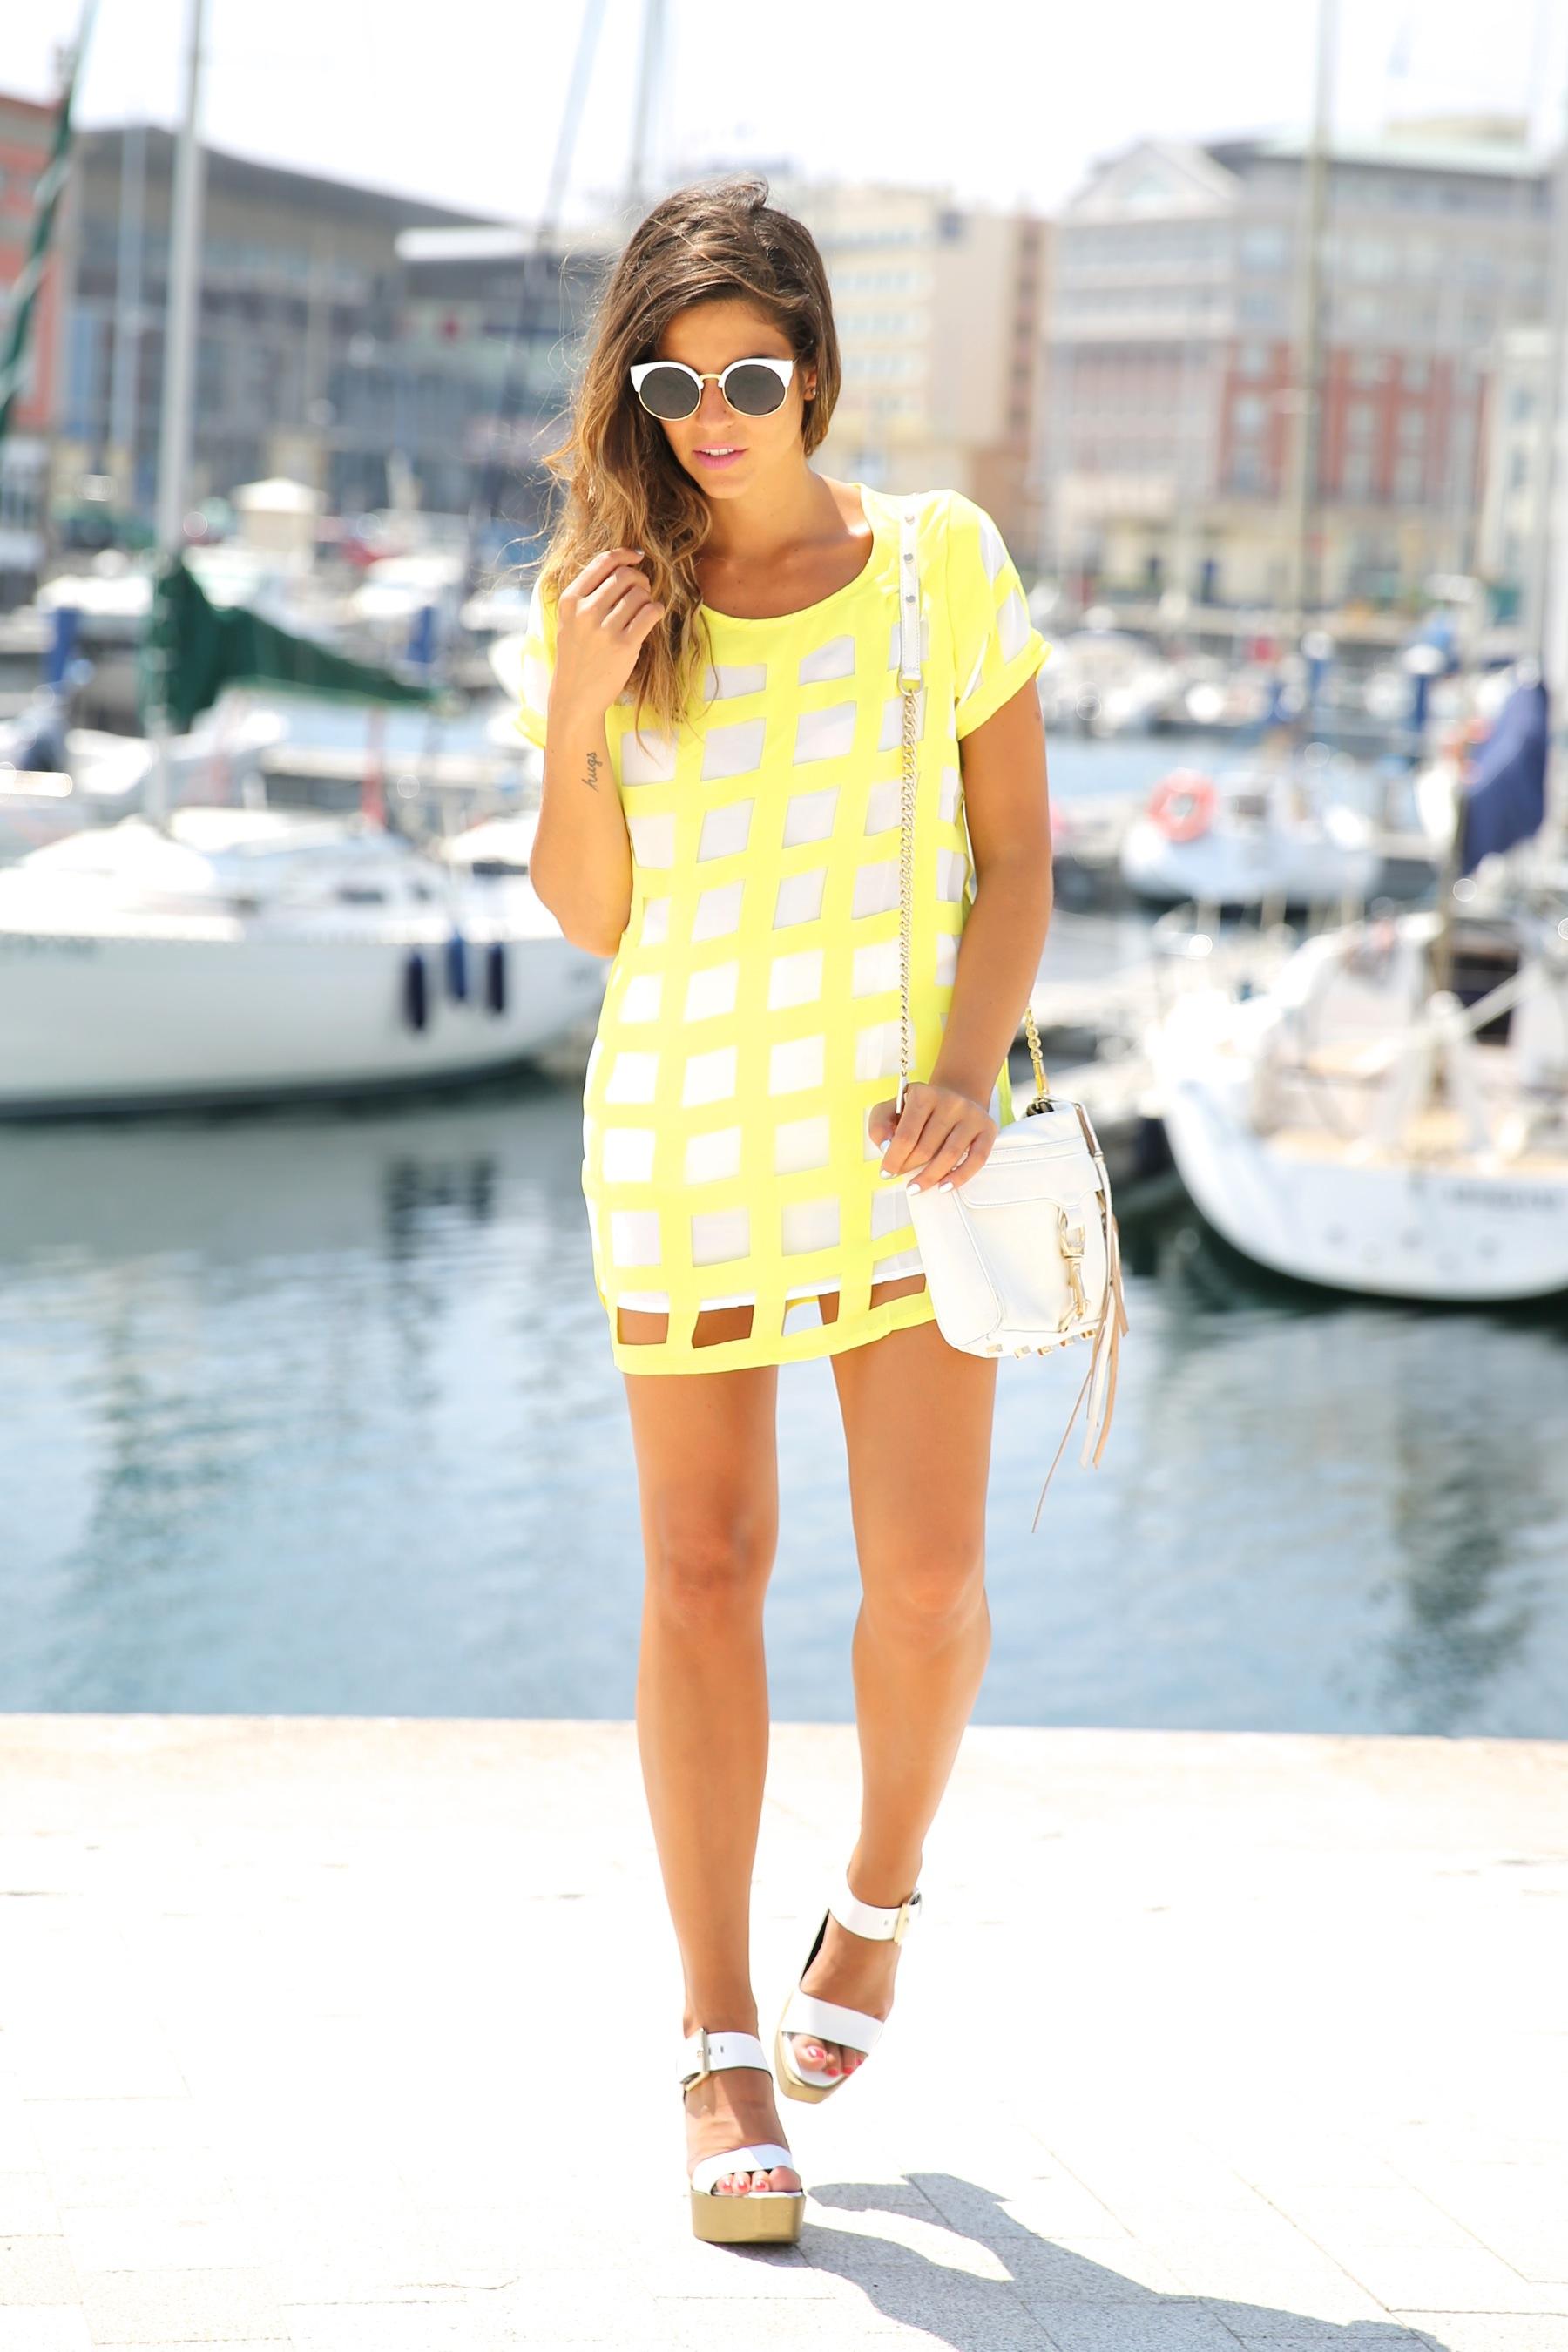 trendy_taste-look-outfit-street_style-ootd-blog-blogger-moda_españa-fashion_spain-coruña-galicia-sandalias_plataforma-platform_sandals-rebecca_minkoff-yellow-amarillo-vestido-dress-plaid-cuadros-9